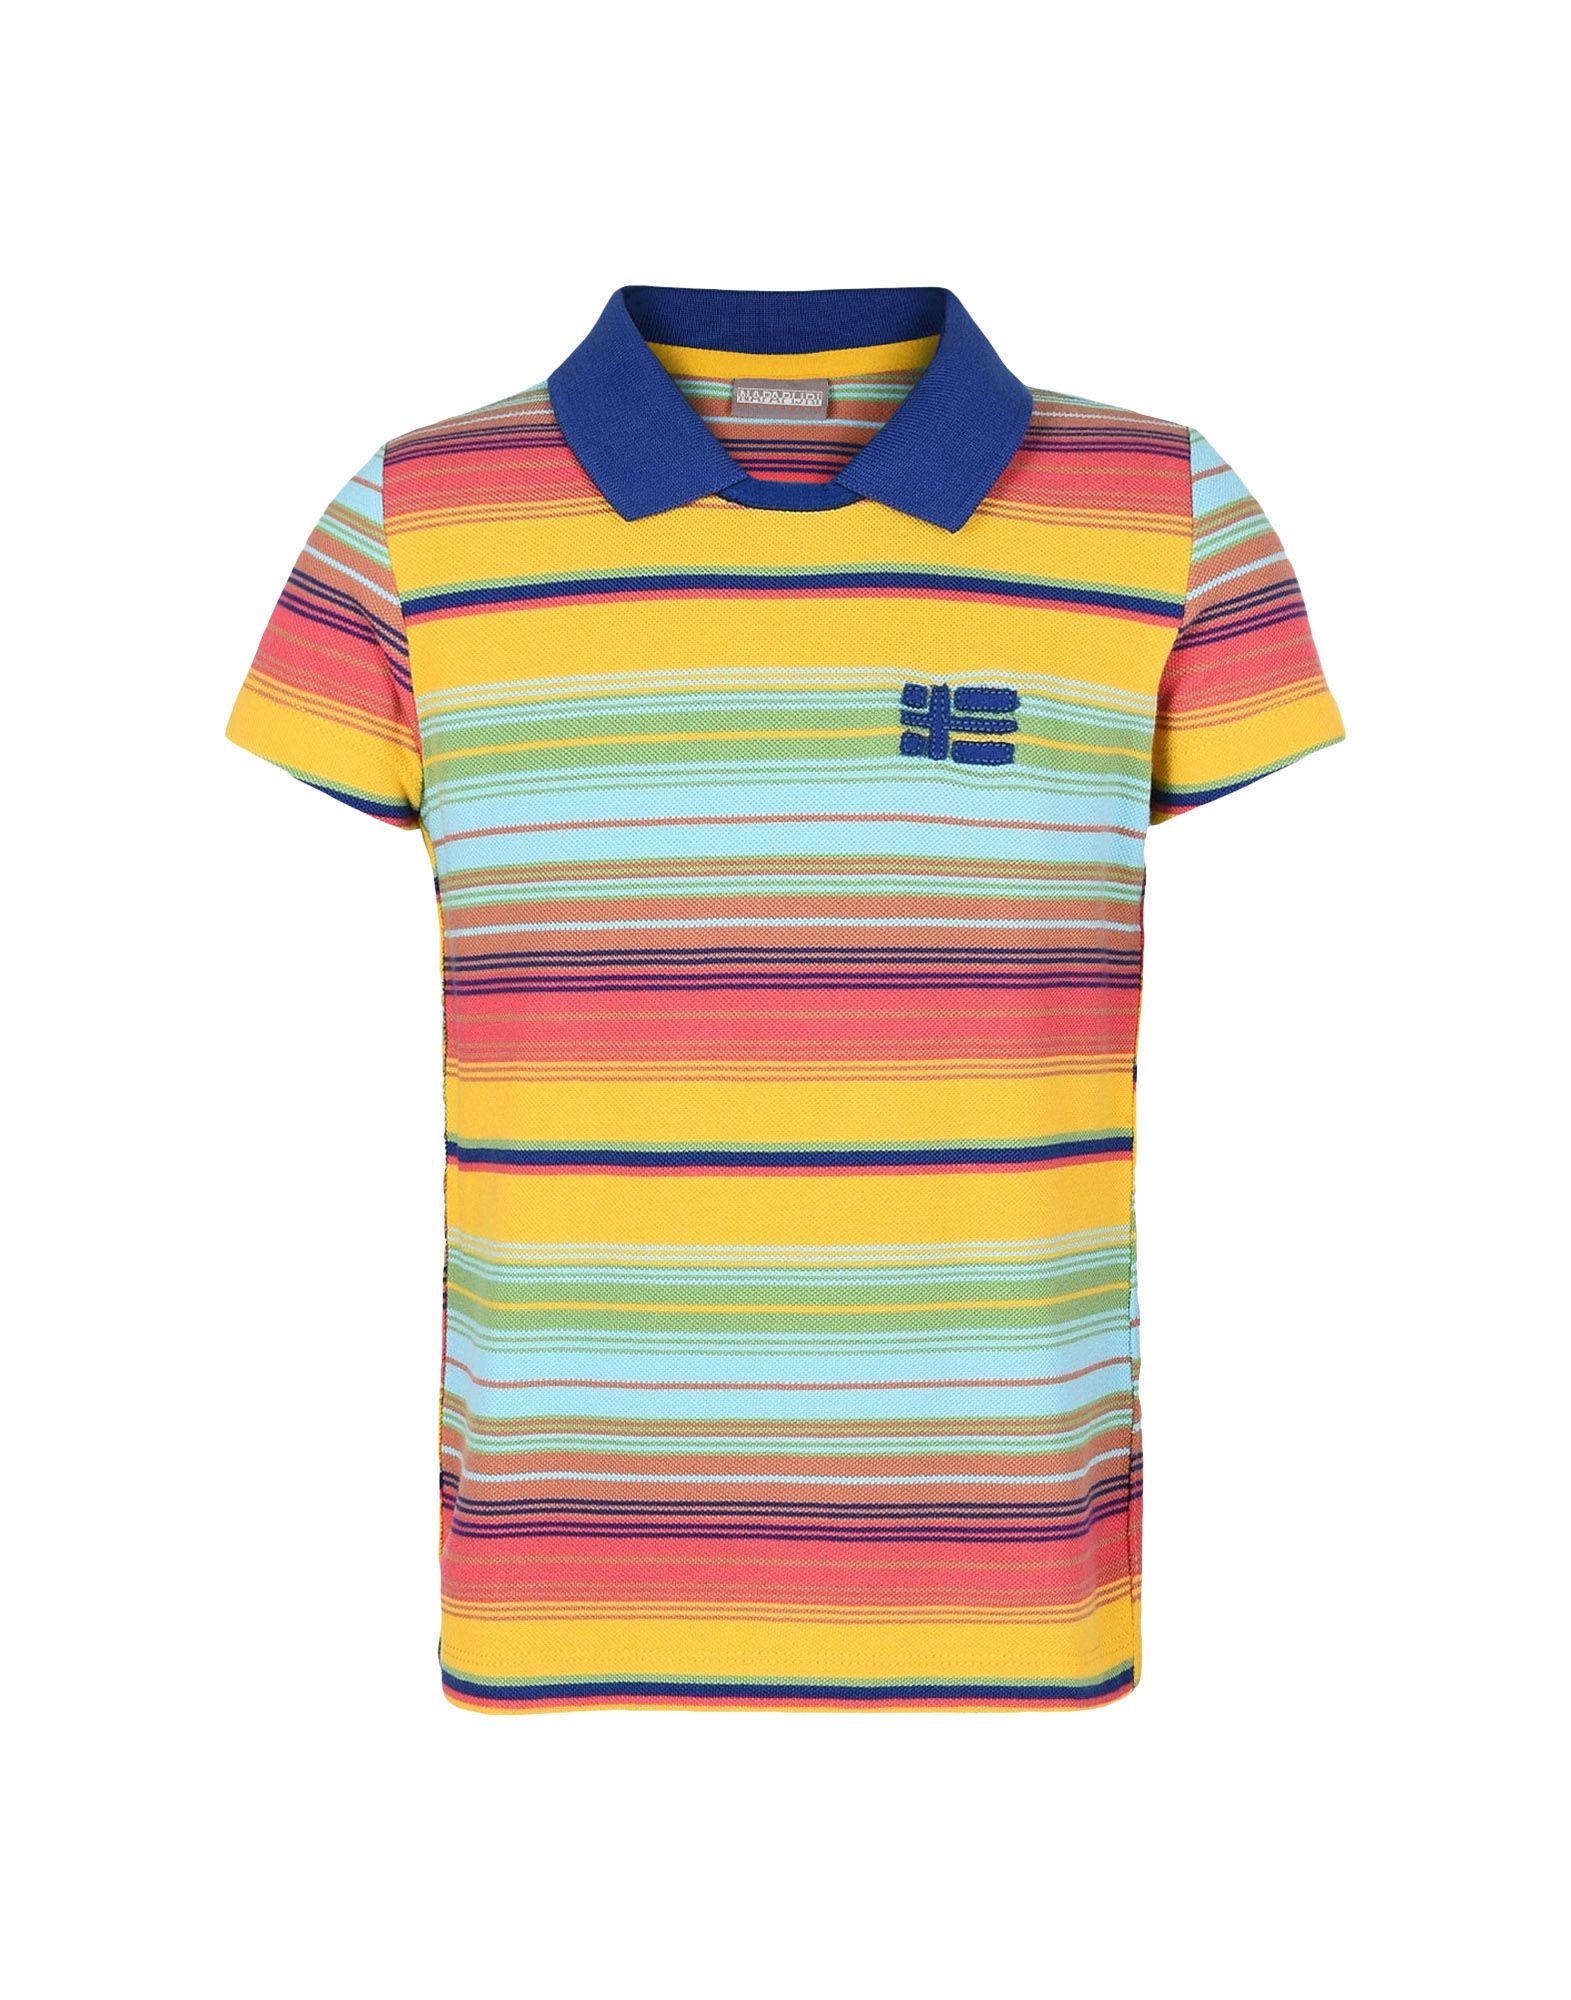 NAPAPIJRI | NAPAPIJRI Polo shirts 12129269 | Goxip